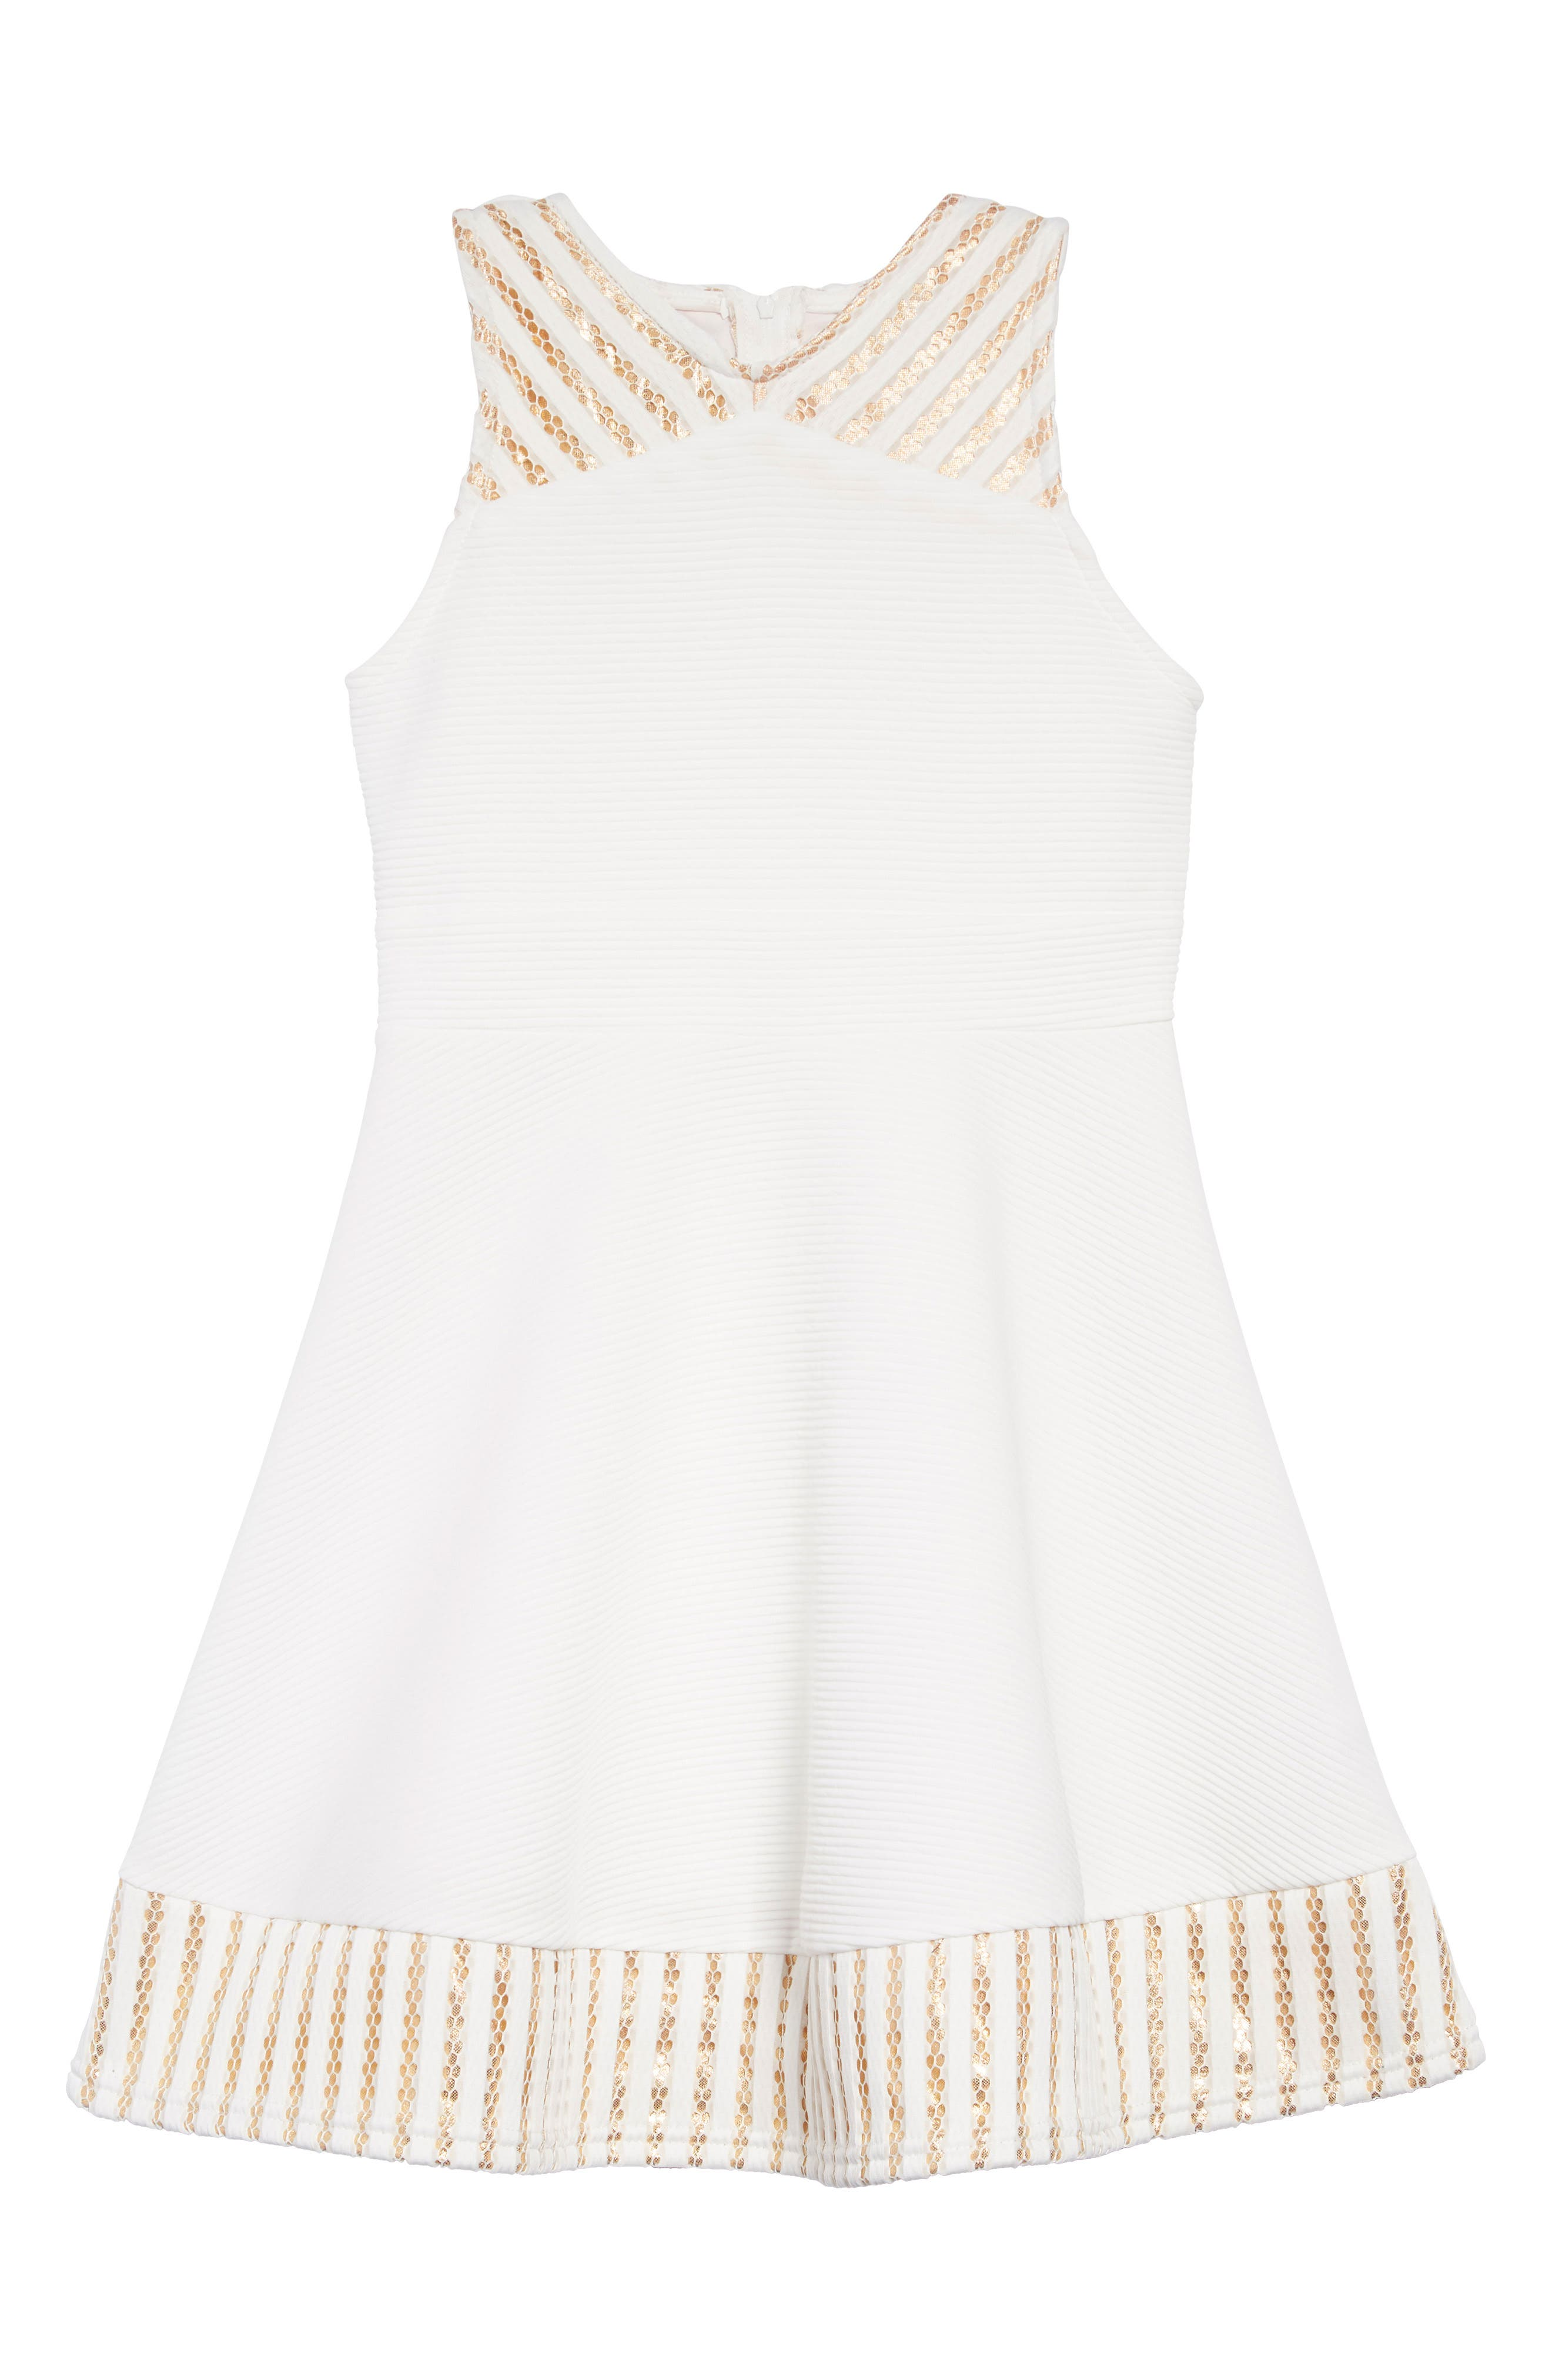 Metallic Trim Ribbed Skater Dress, Main, color, WHITE/GOLD